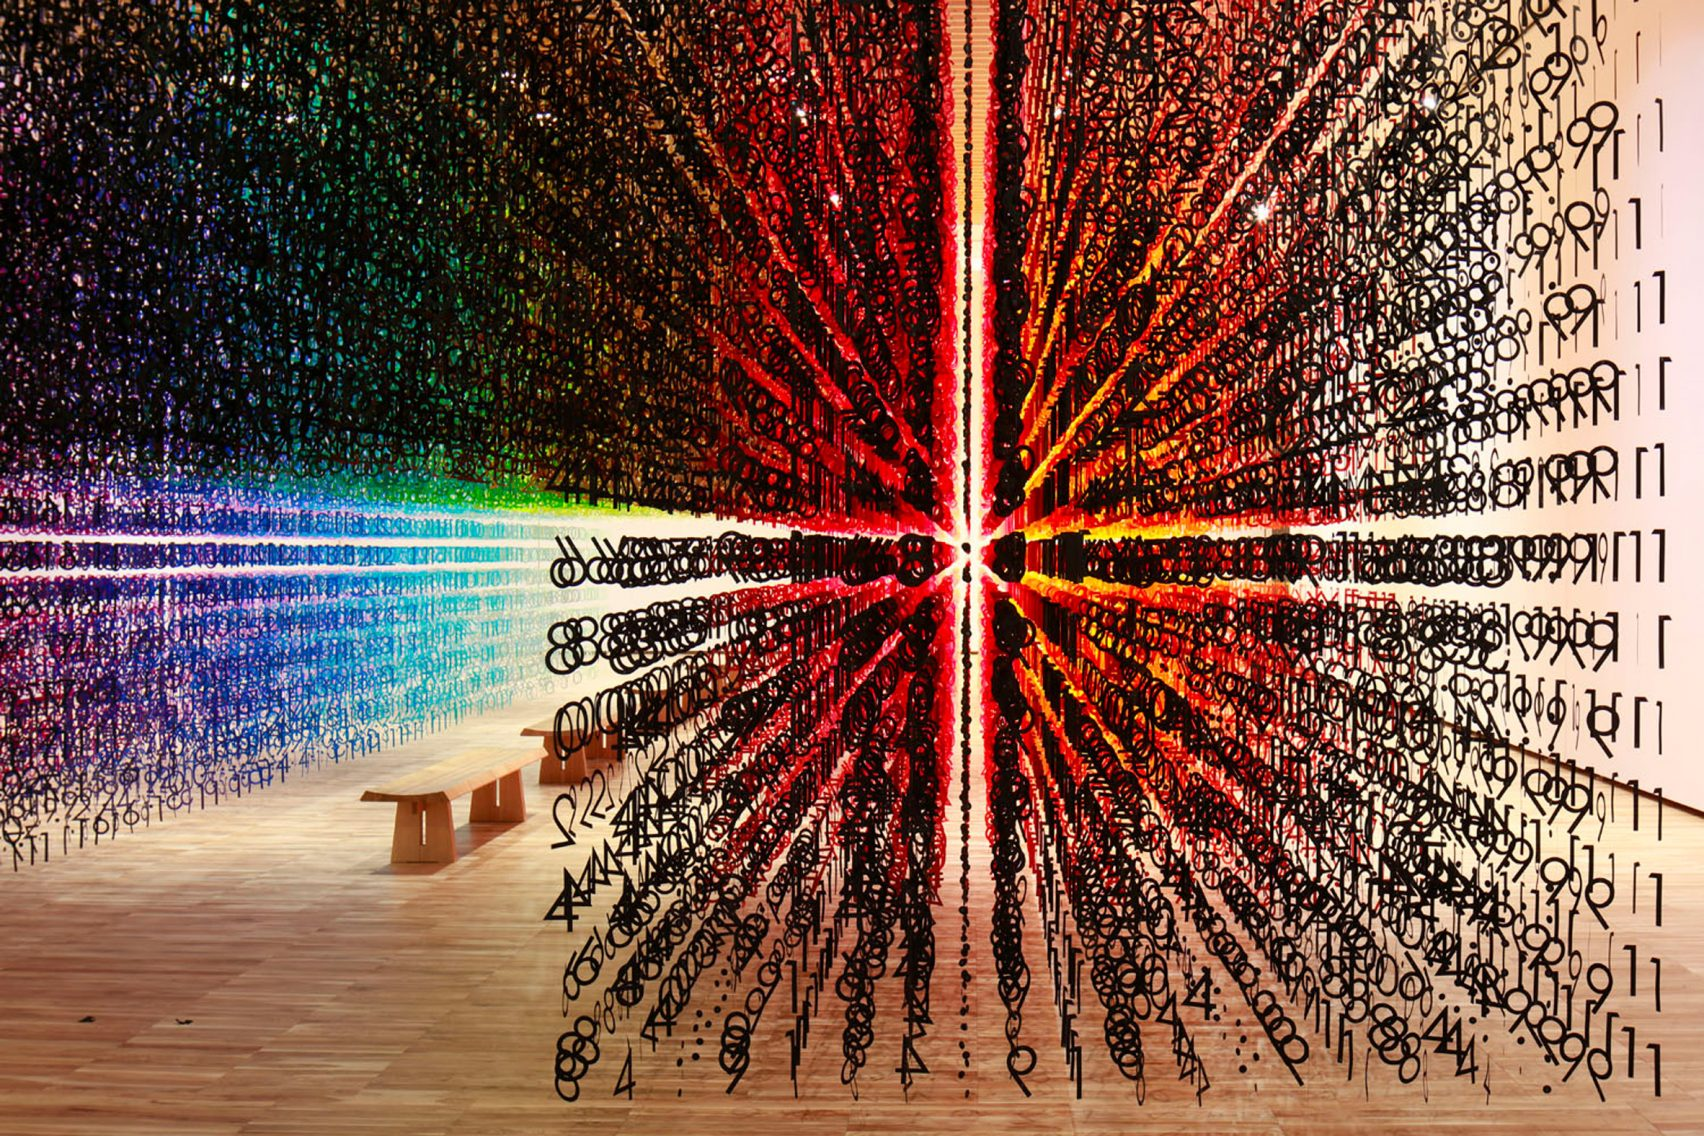 colour-of-time-emmanuelle-moureaux-installation-rainbow-toyama-museum-art-design-japan_dezeen_2364_col_2-1704x1136.jpg